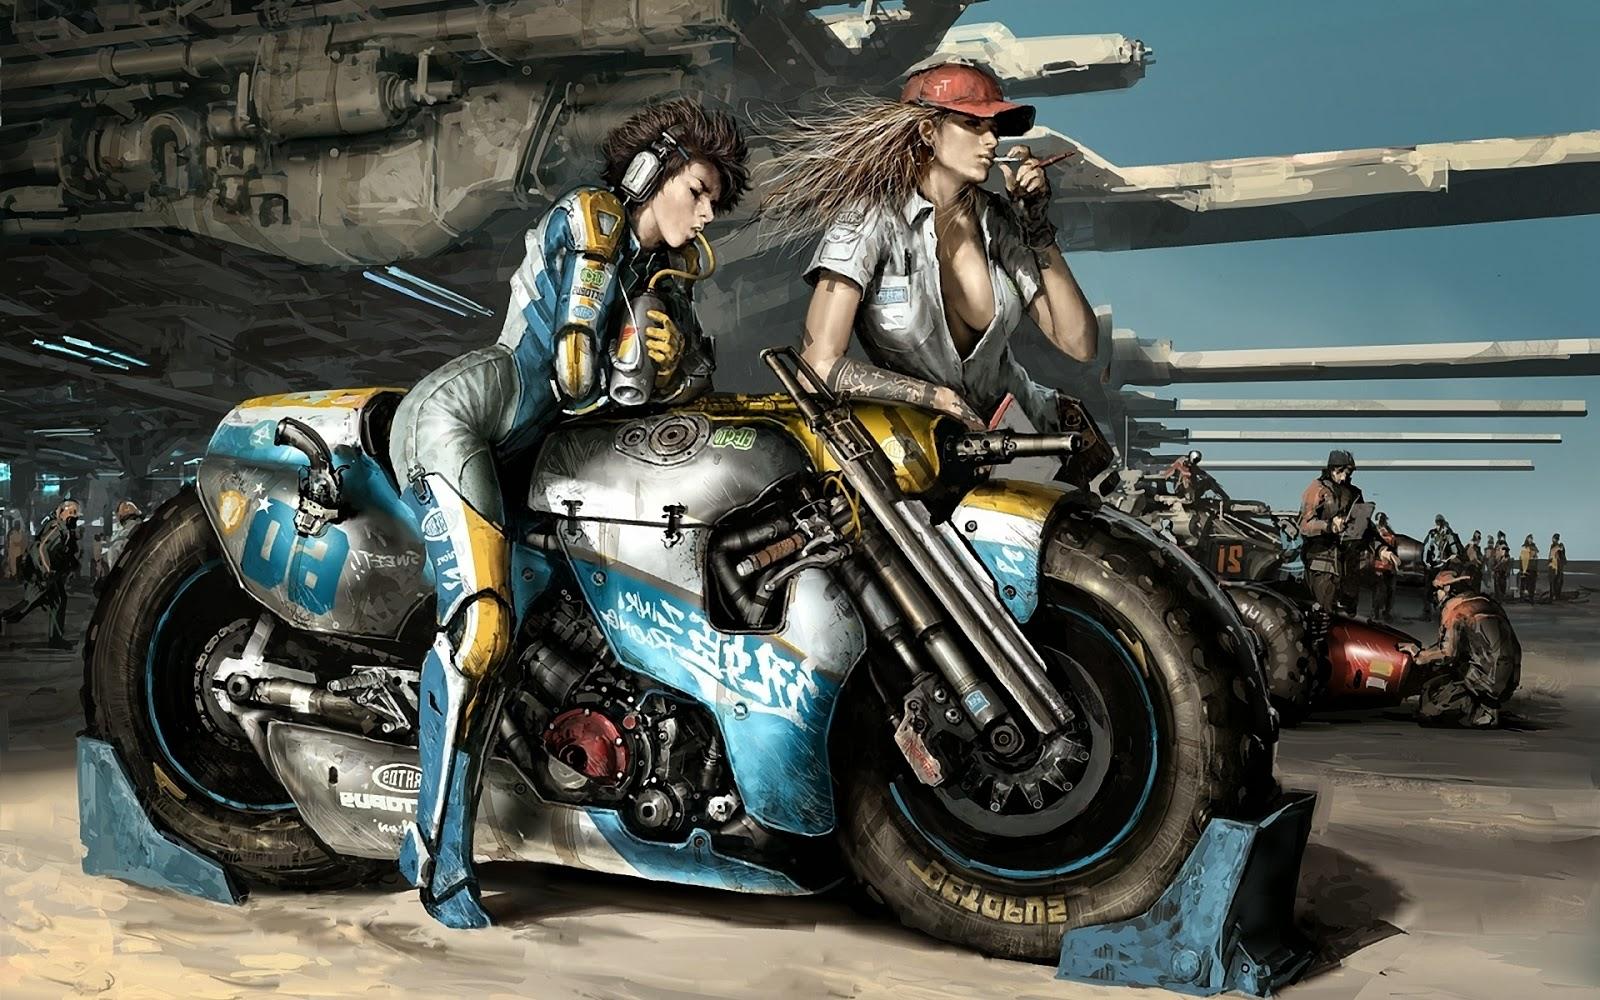 sexy girls bikes wallpapers - photo #12